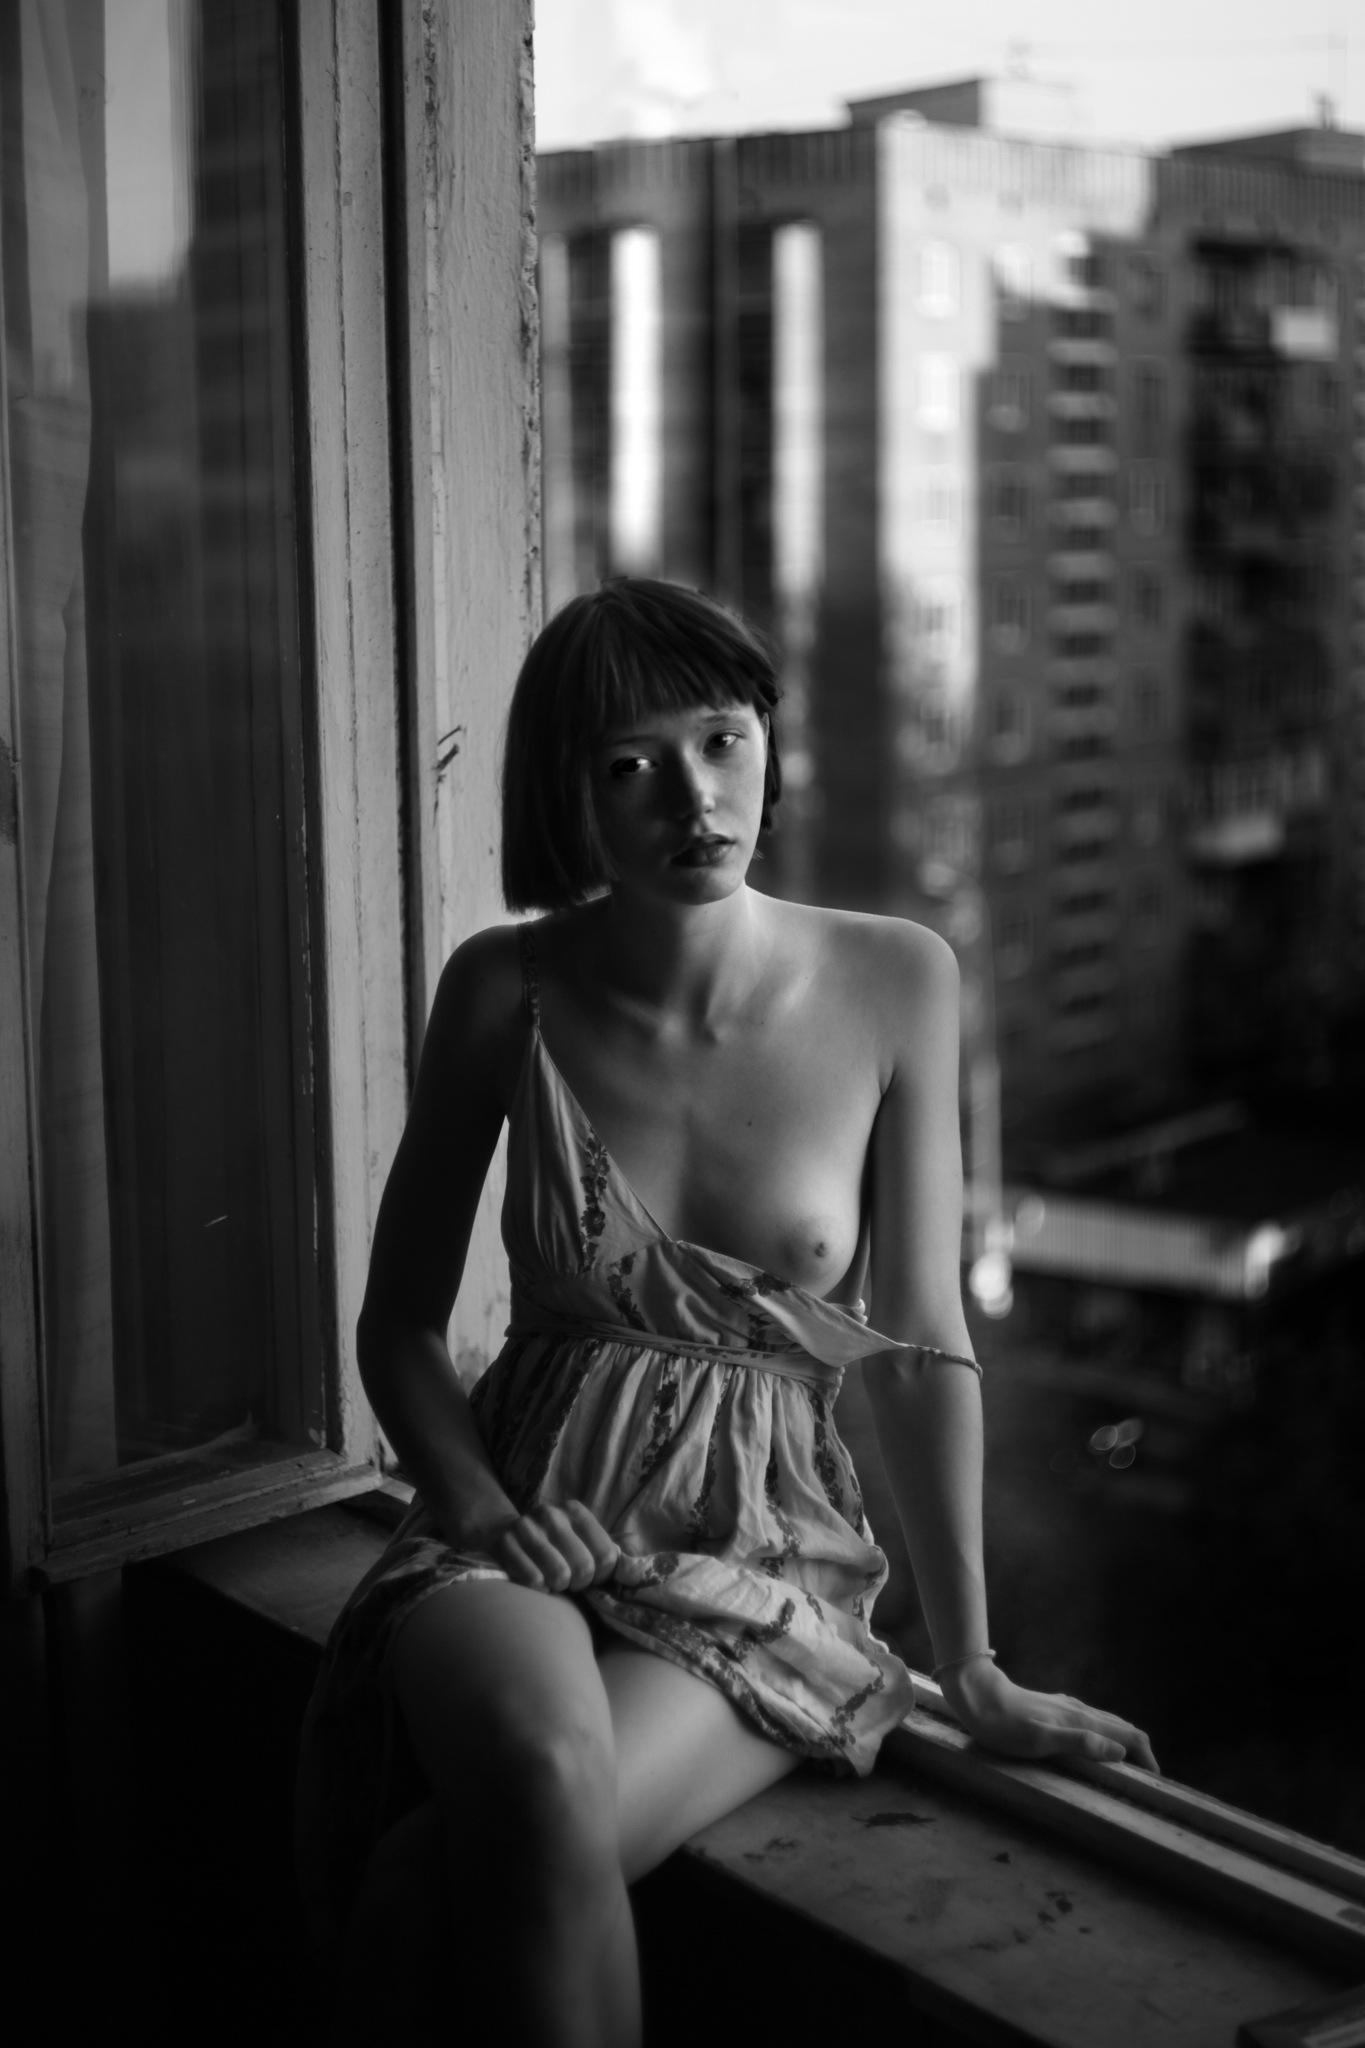 Amature nude women galleries